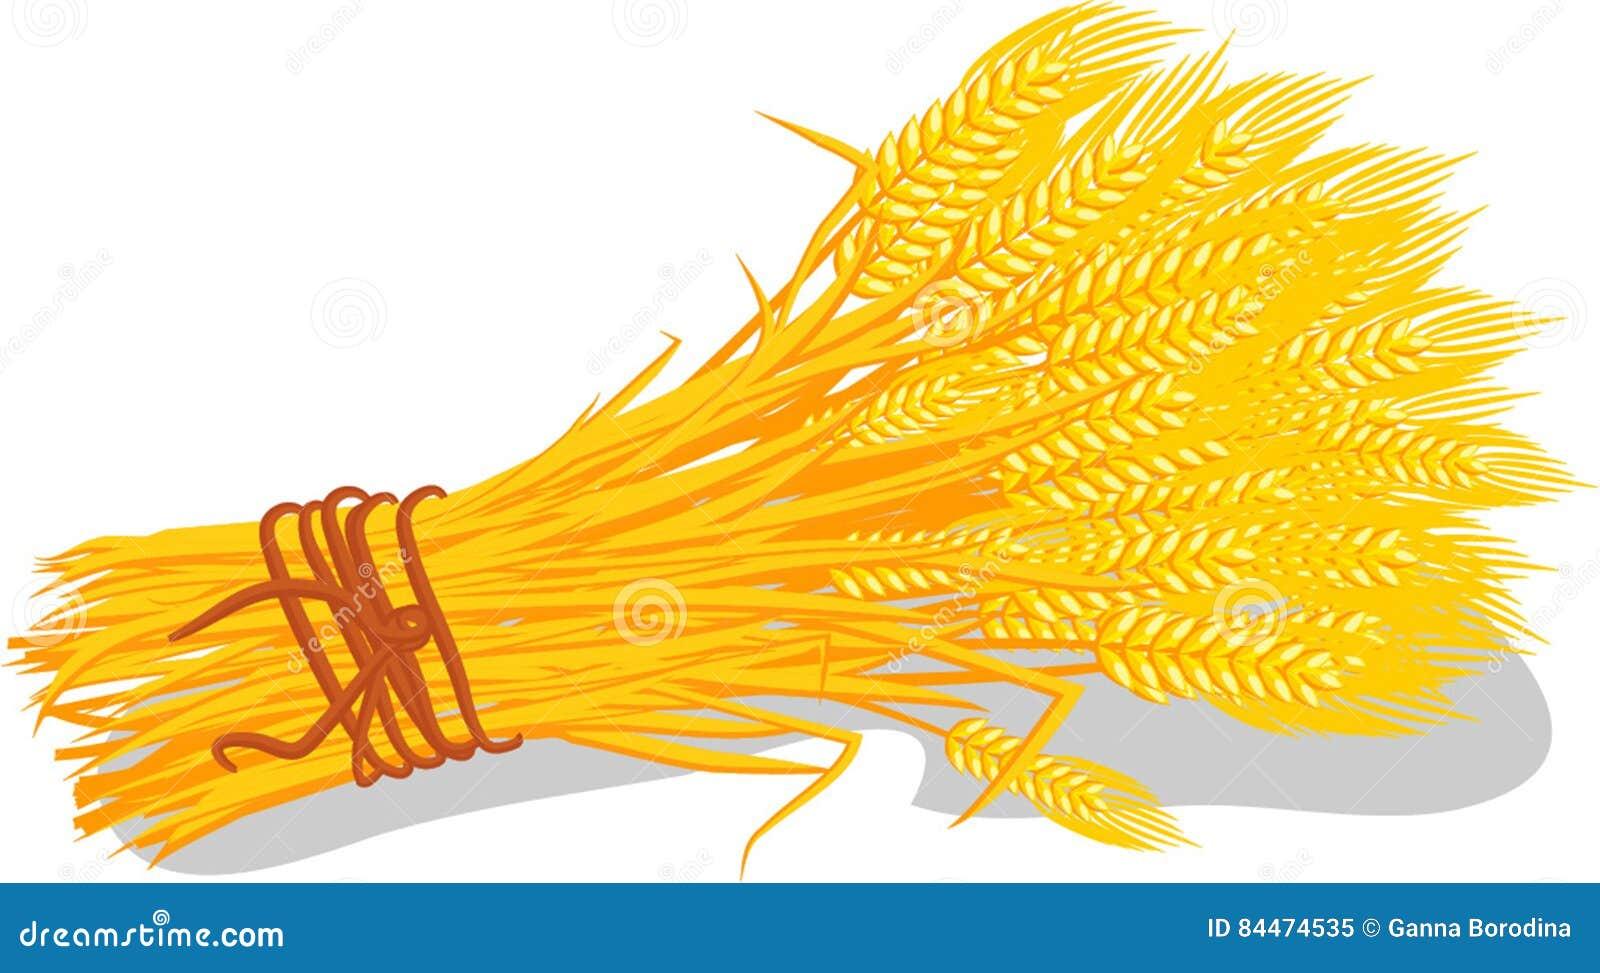 Wheat And Grain Free Food